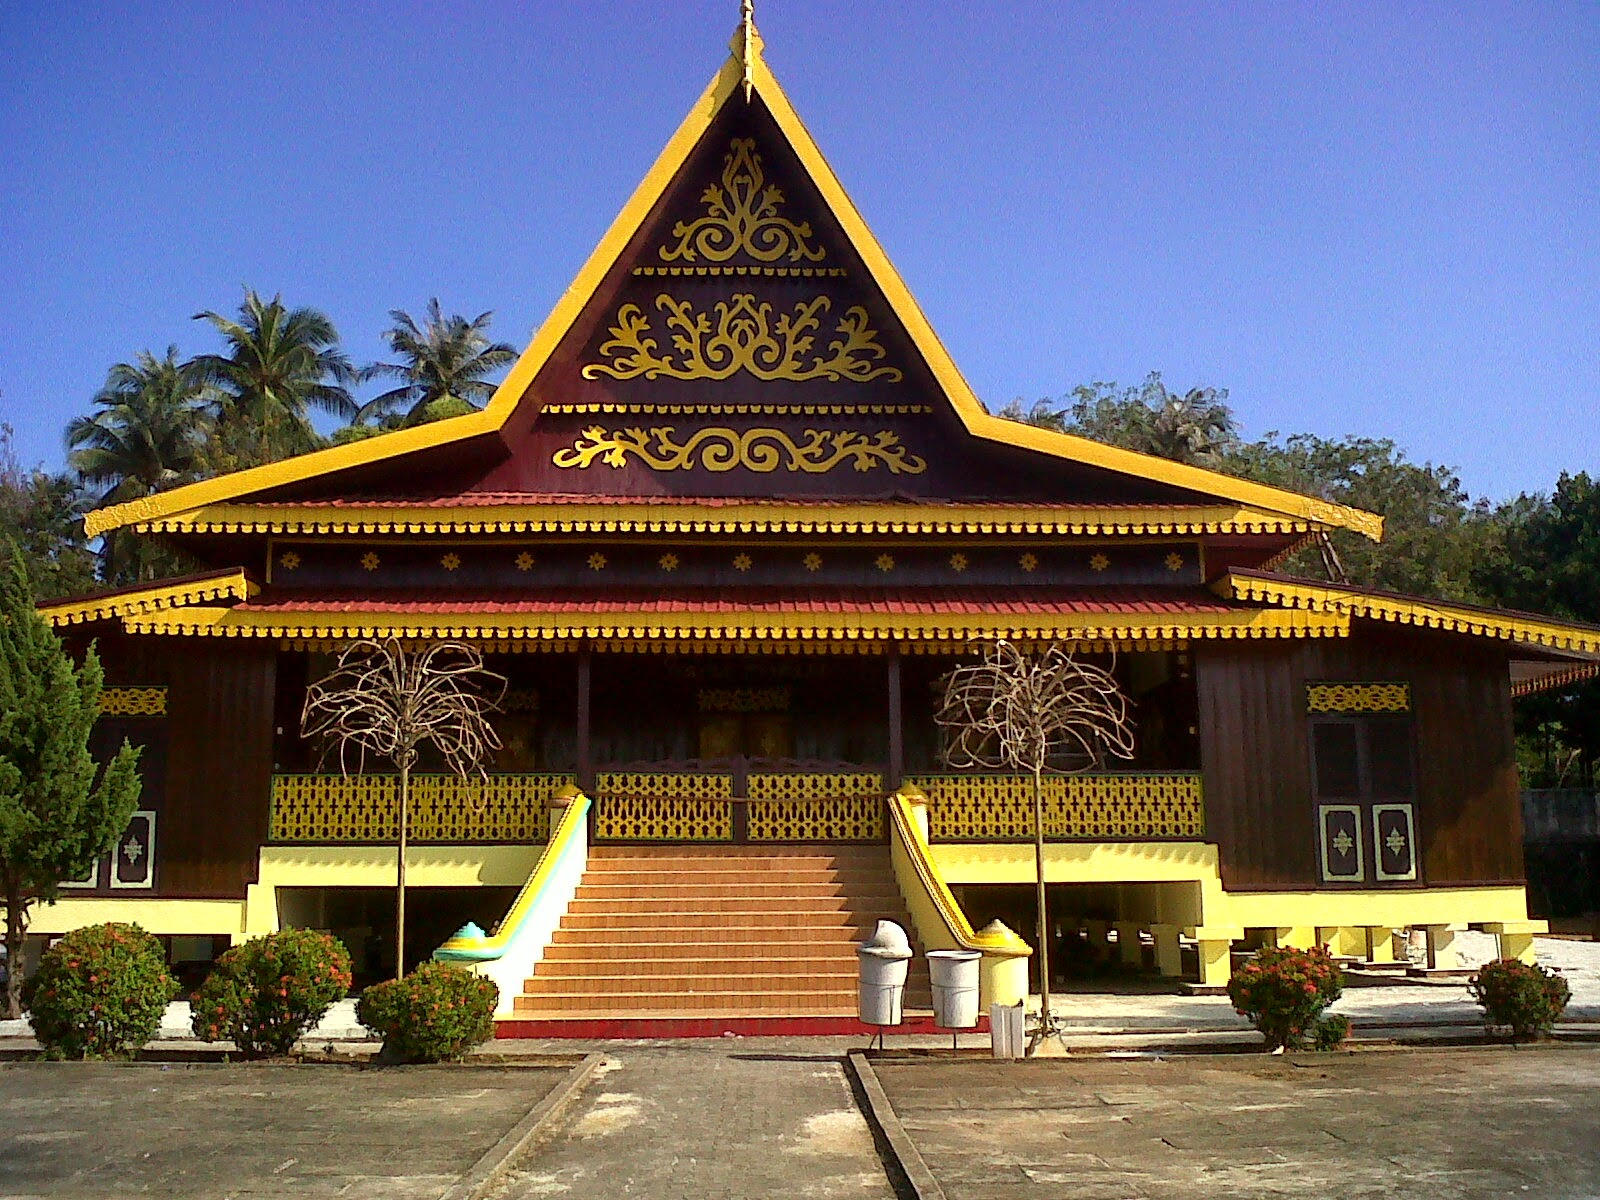 Desain Rumah Adat Melayu Gambarrrrrrr Gambar Kepulauan Riau